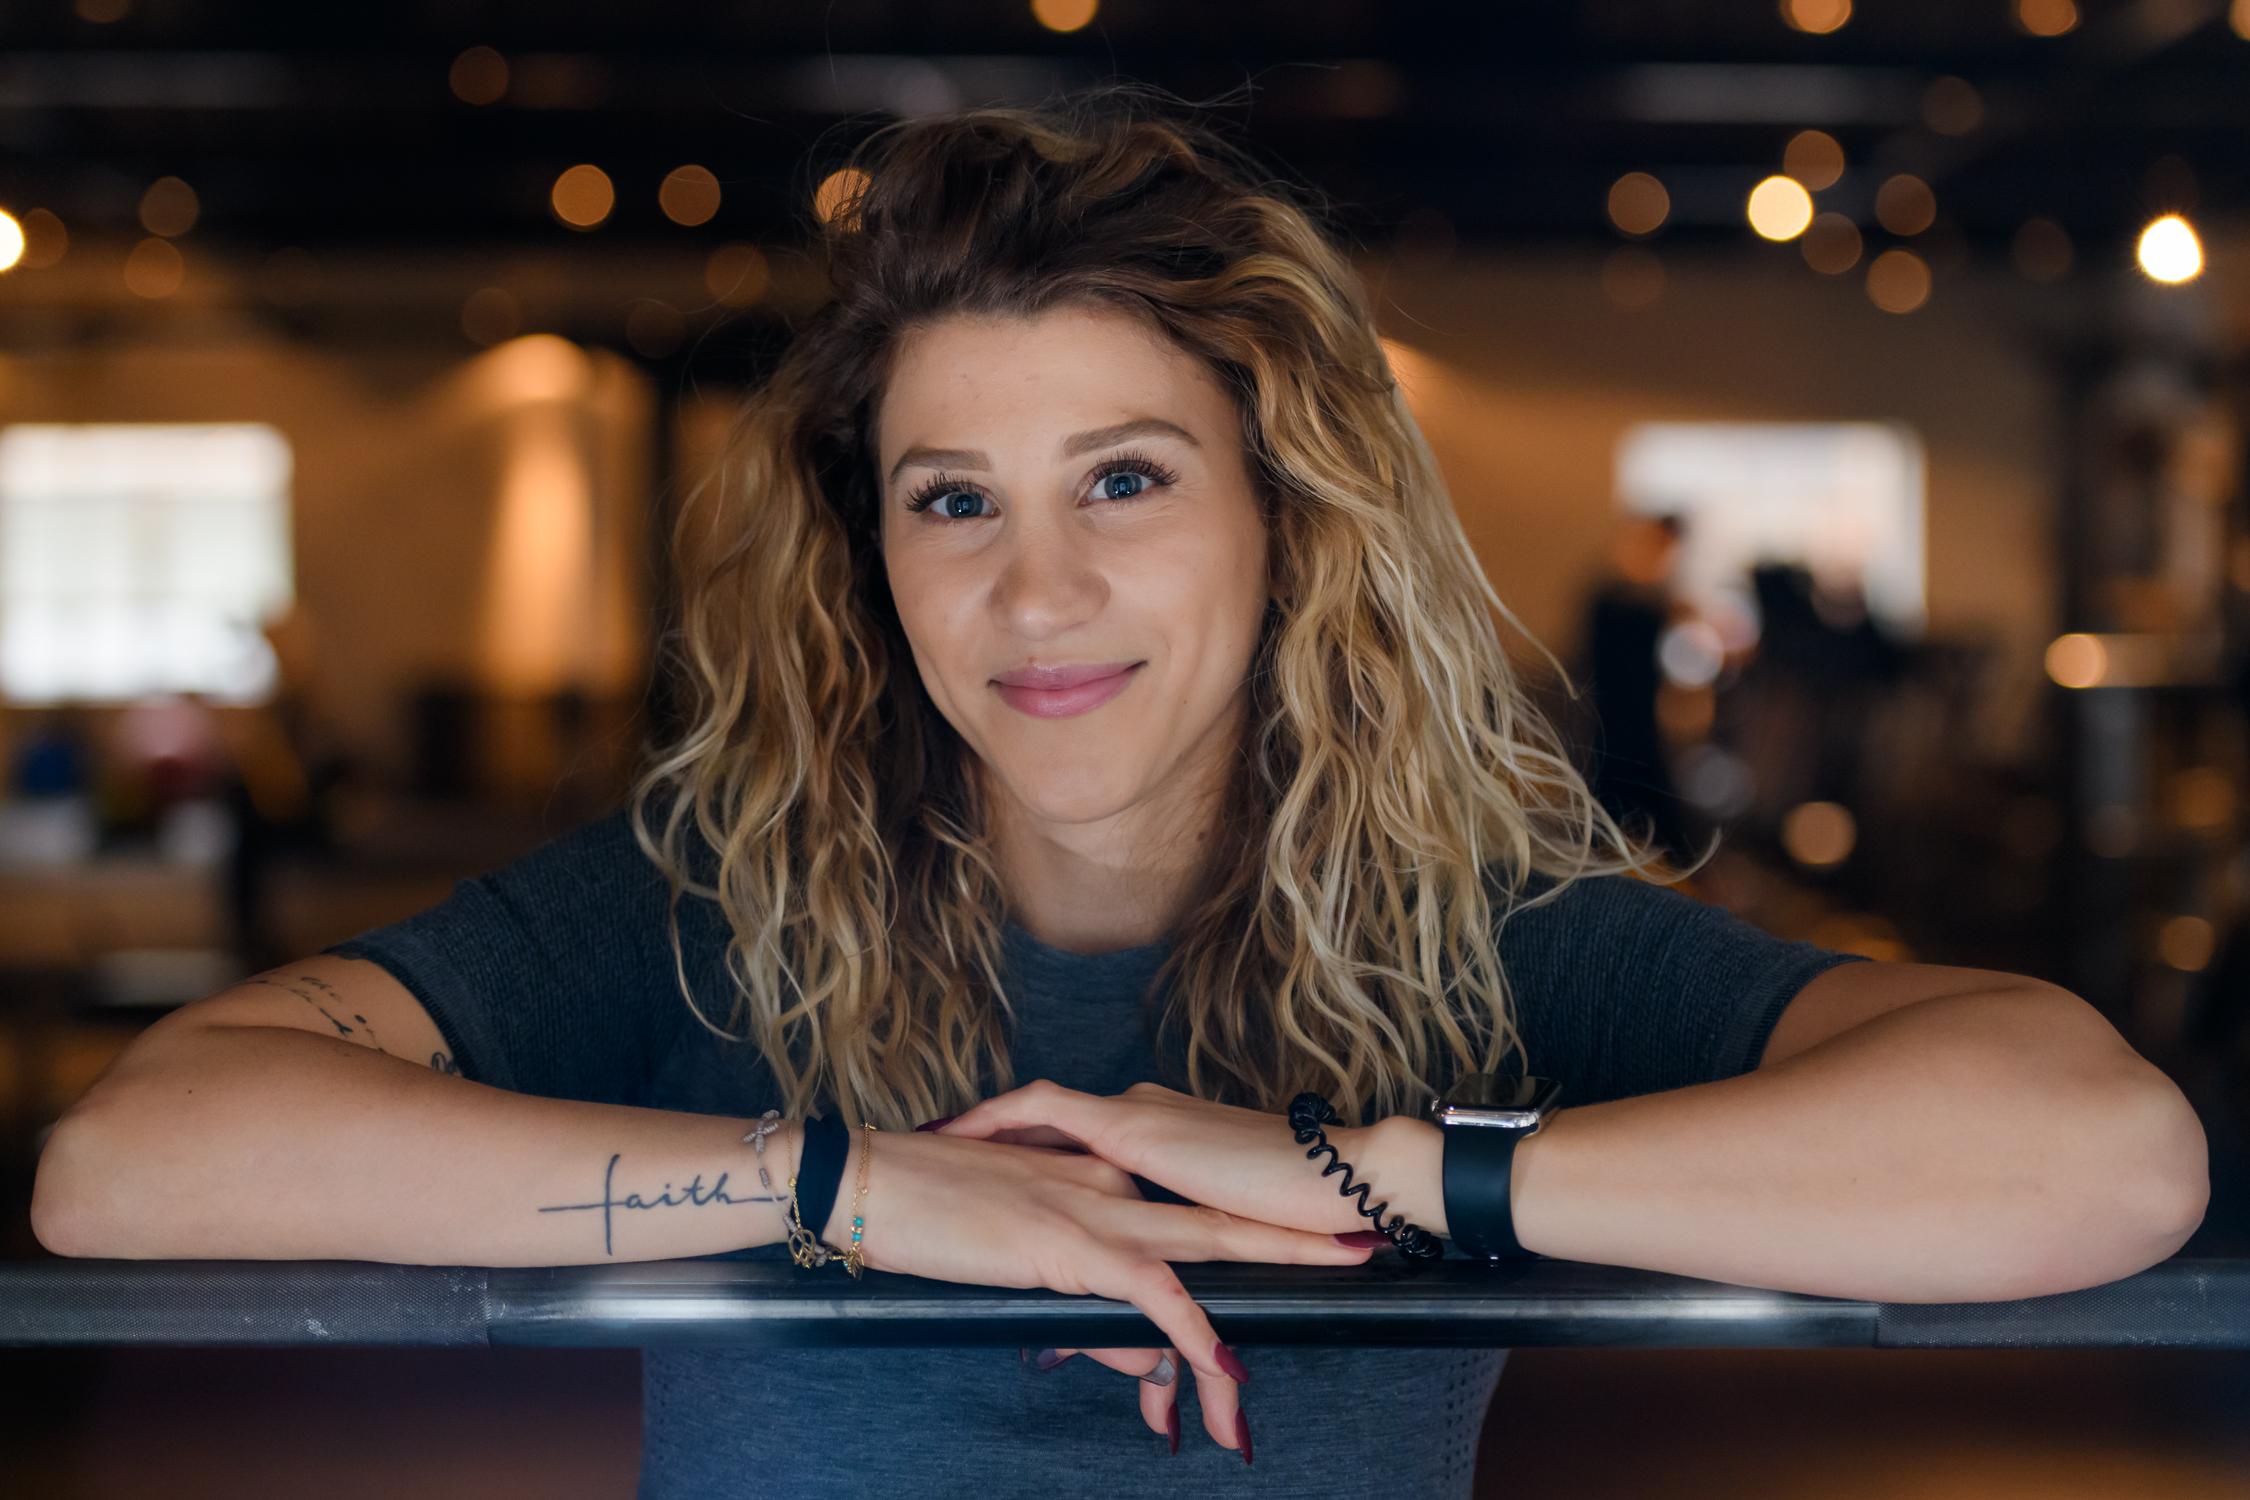 Joanna Nassif, Personal Trainer